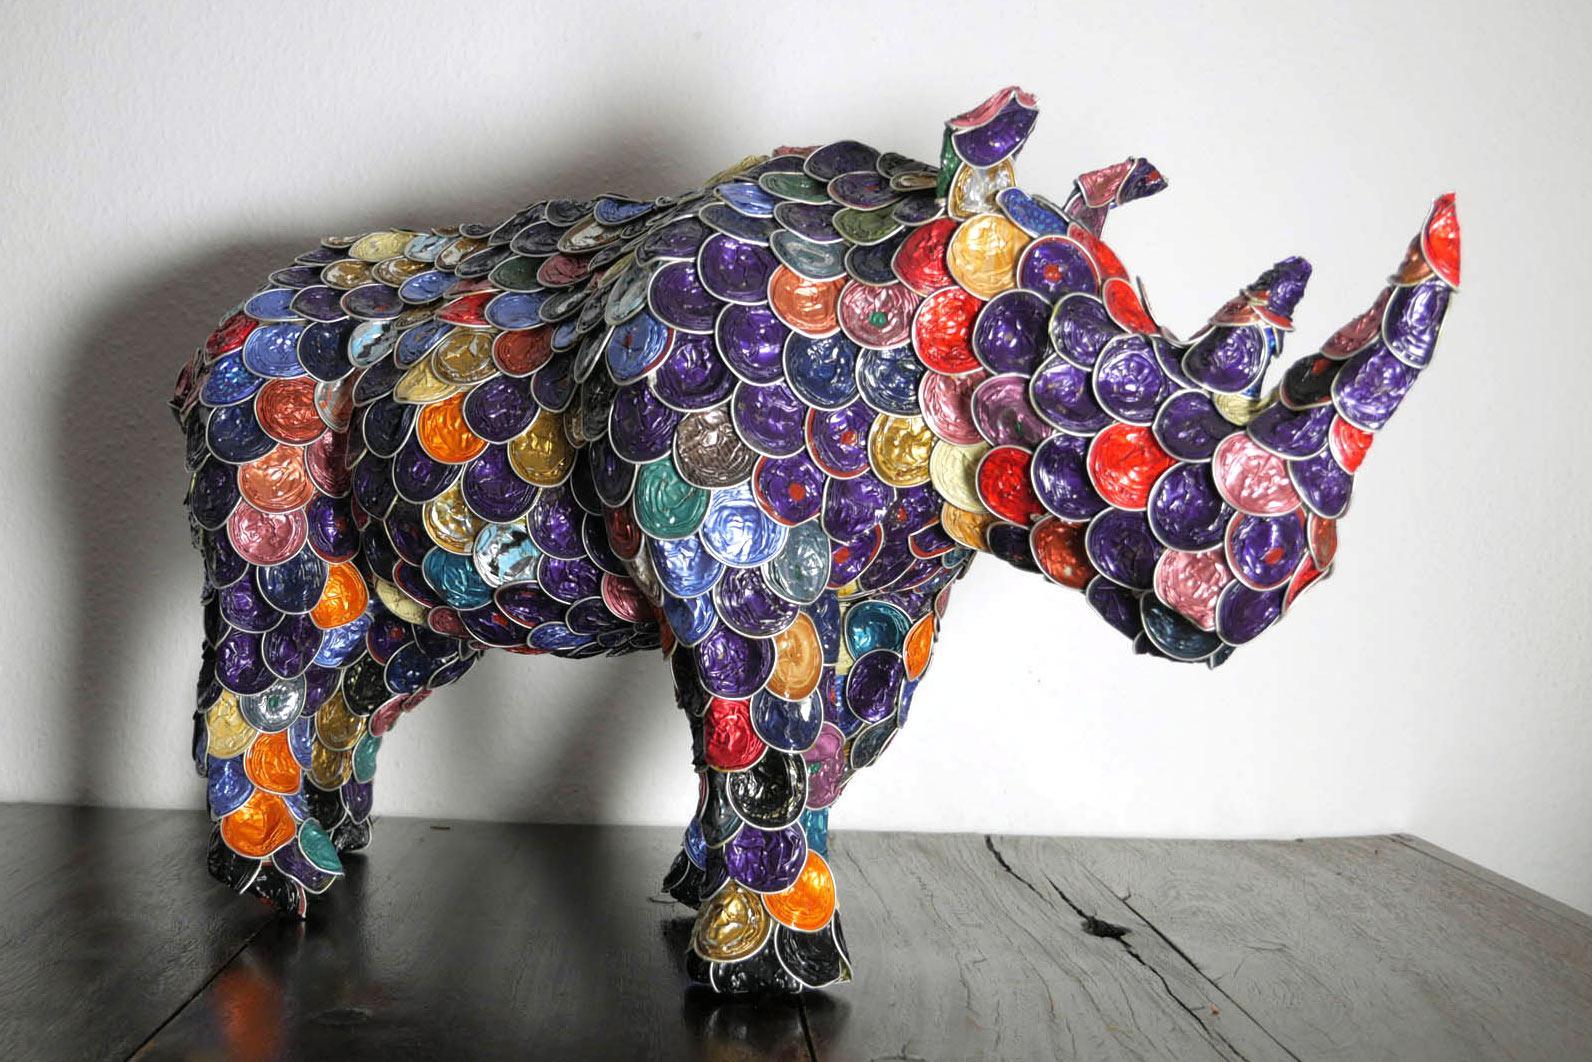 Rhino/Nashorn aus alten Kaffeekapseln (upcycling)